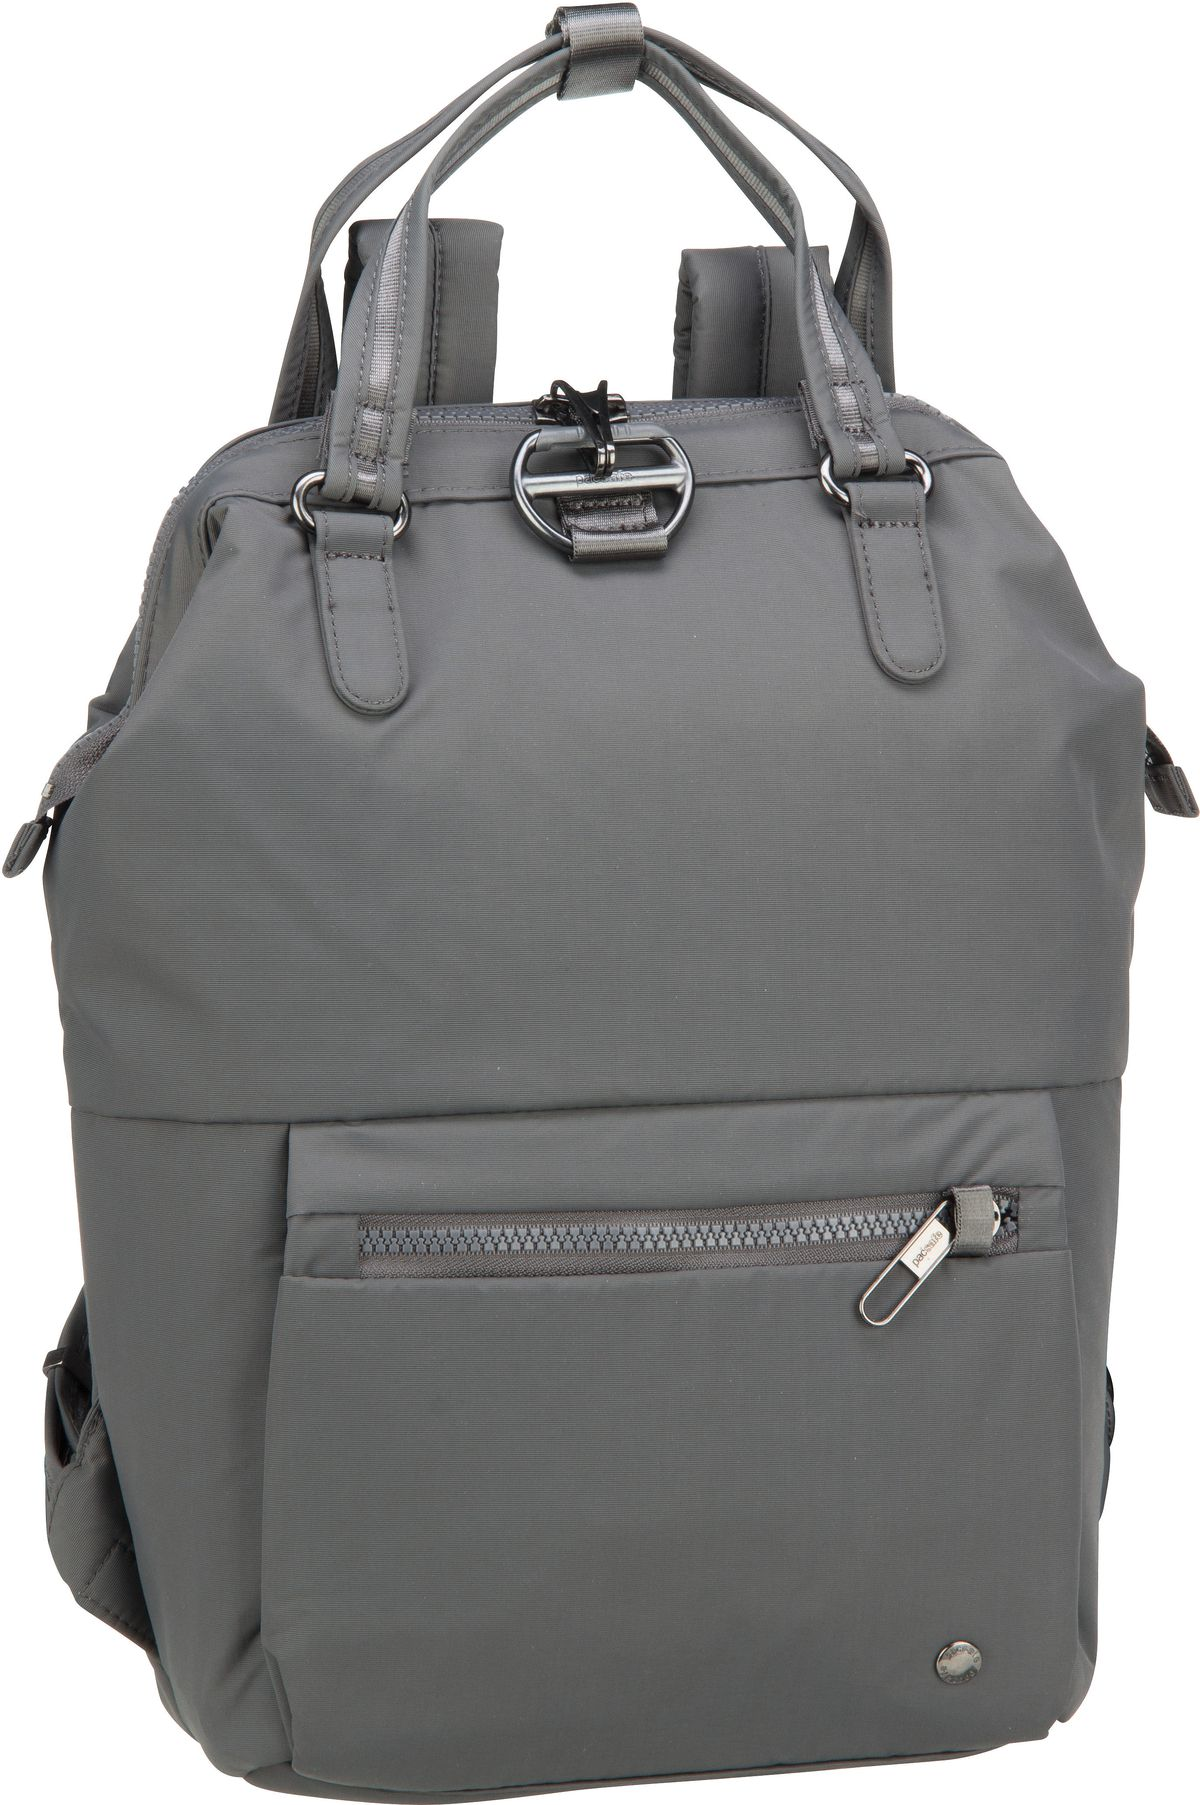 Rucksack / Daypack Citysafe CX Mini Backpack Econyl Storm (11 Liter)